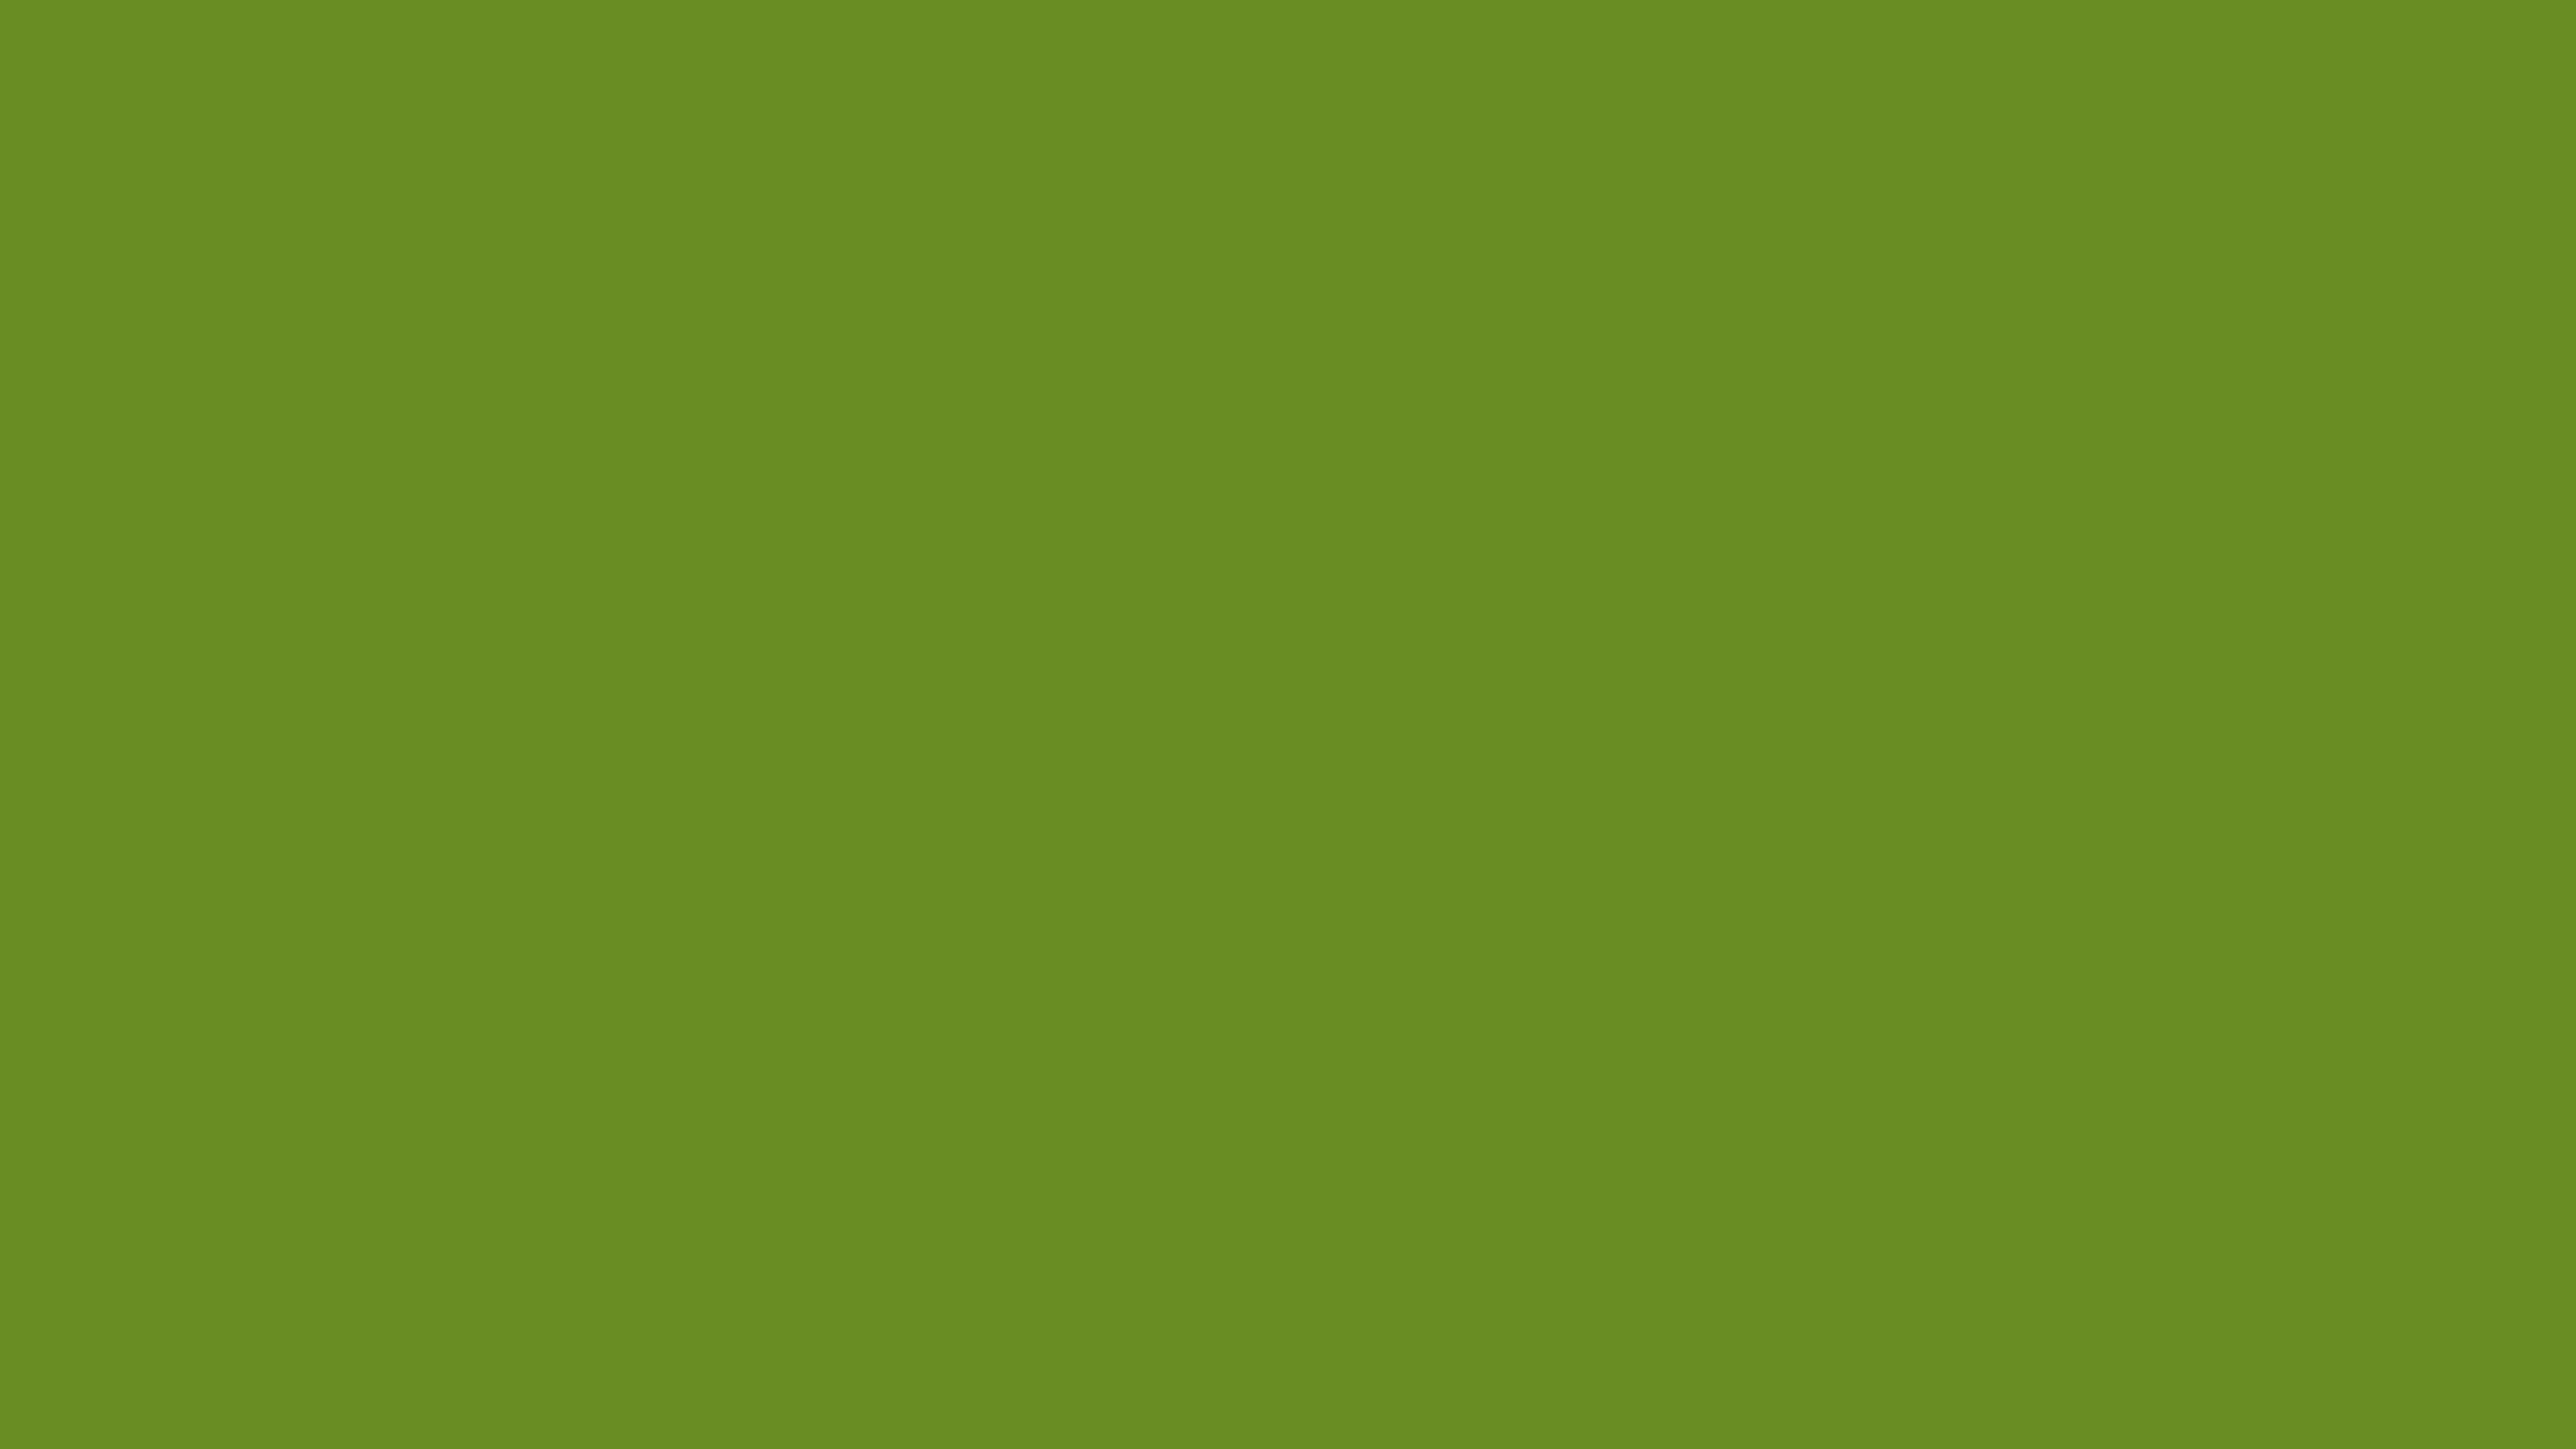 3840x2160 Olive Green Wallpaper